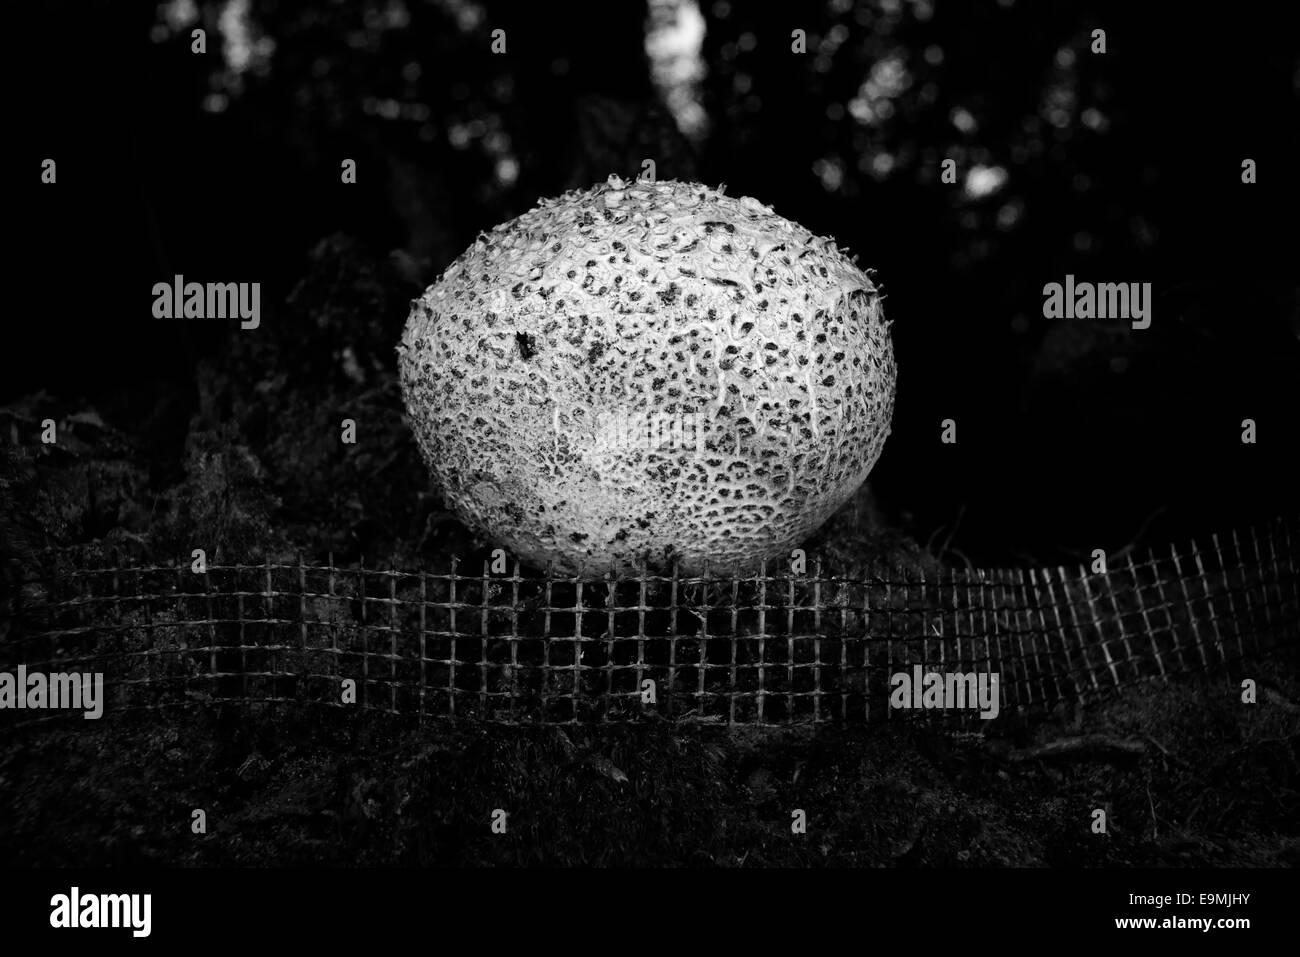 Round fenced mushroom - Stock Image